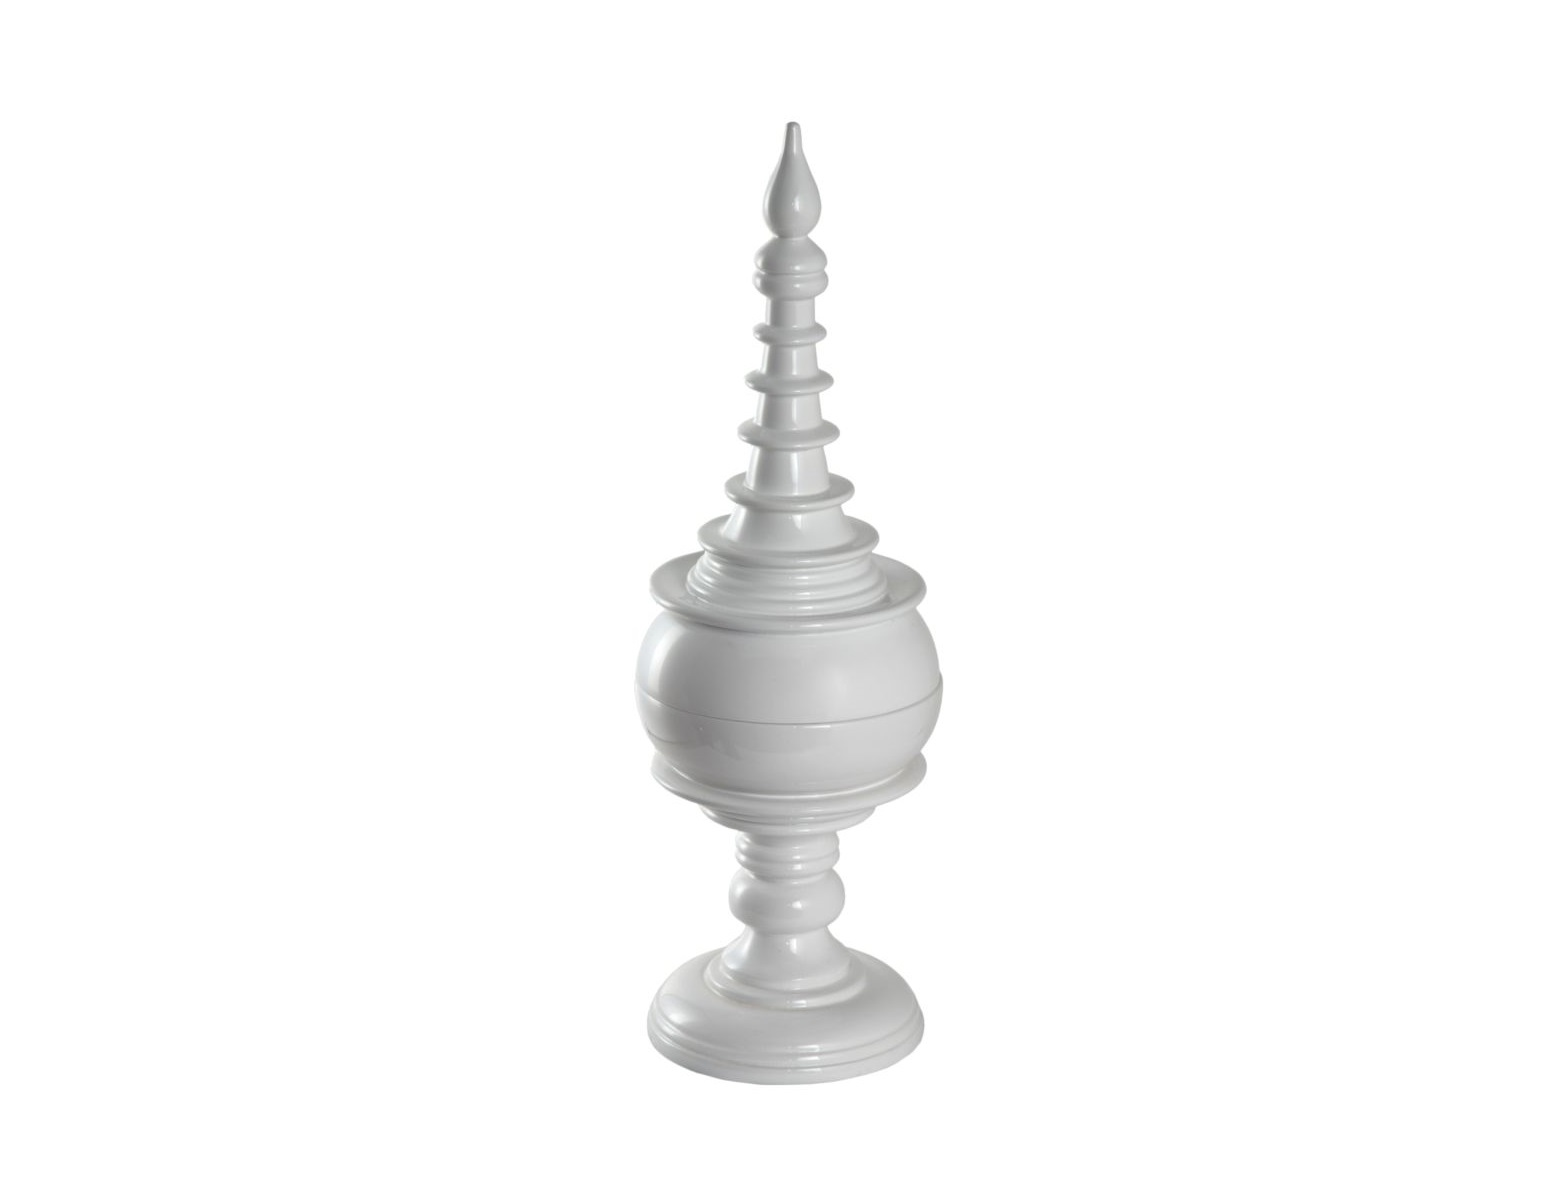 Декоративная ваза M-Style 15436351 от thefurnish